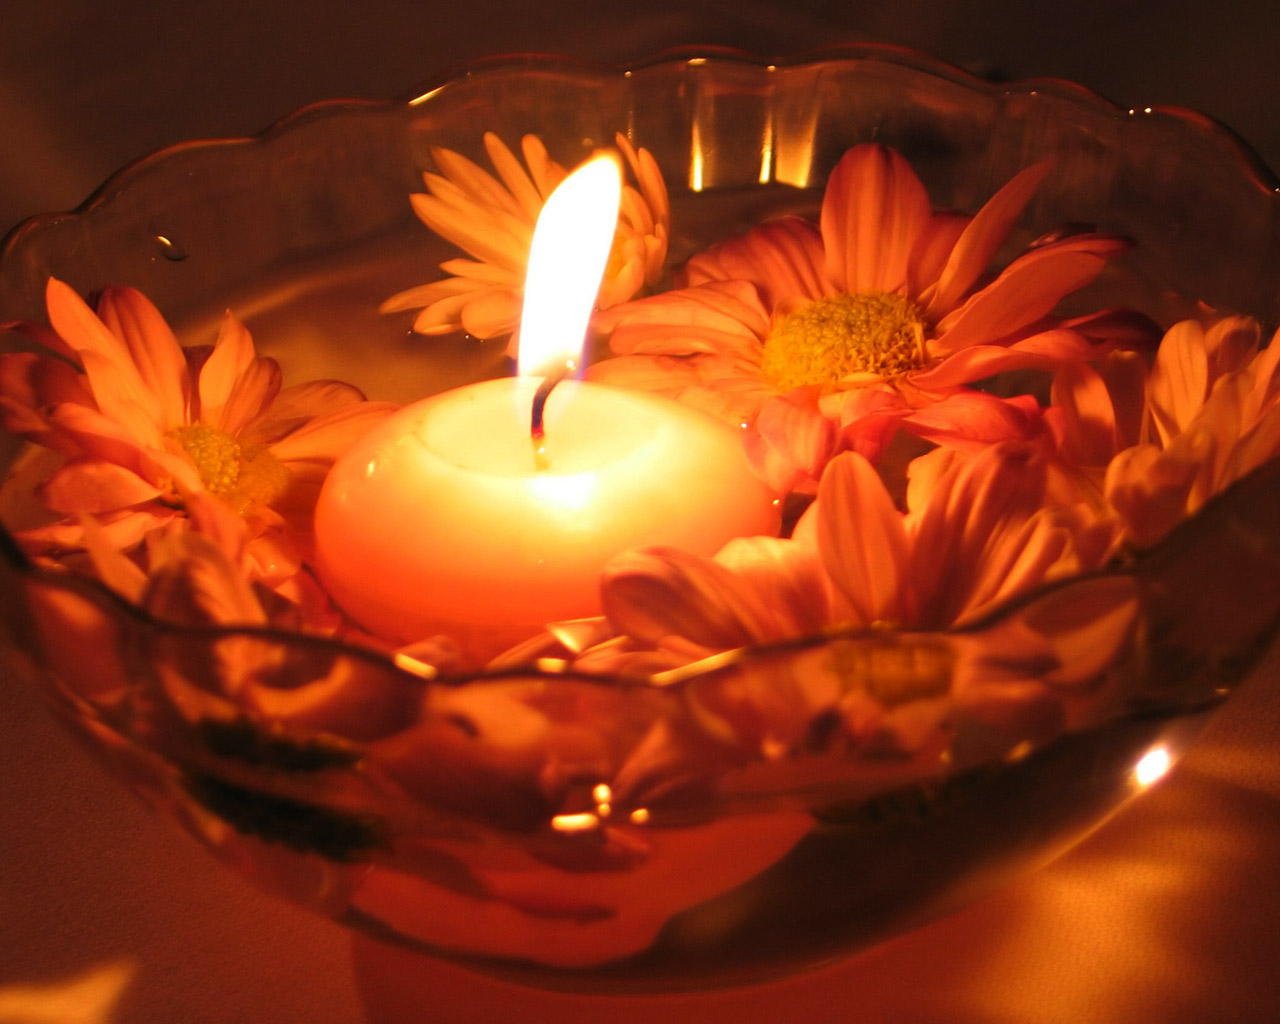 Candles Wallpaper 1280x1024